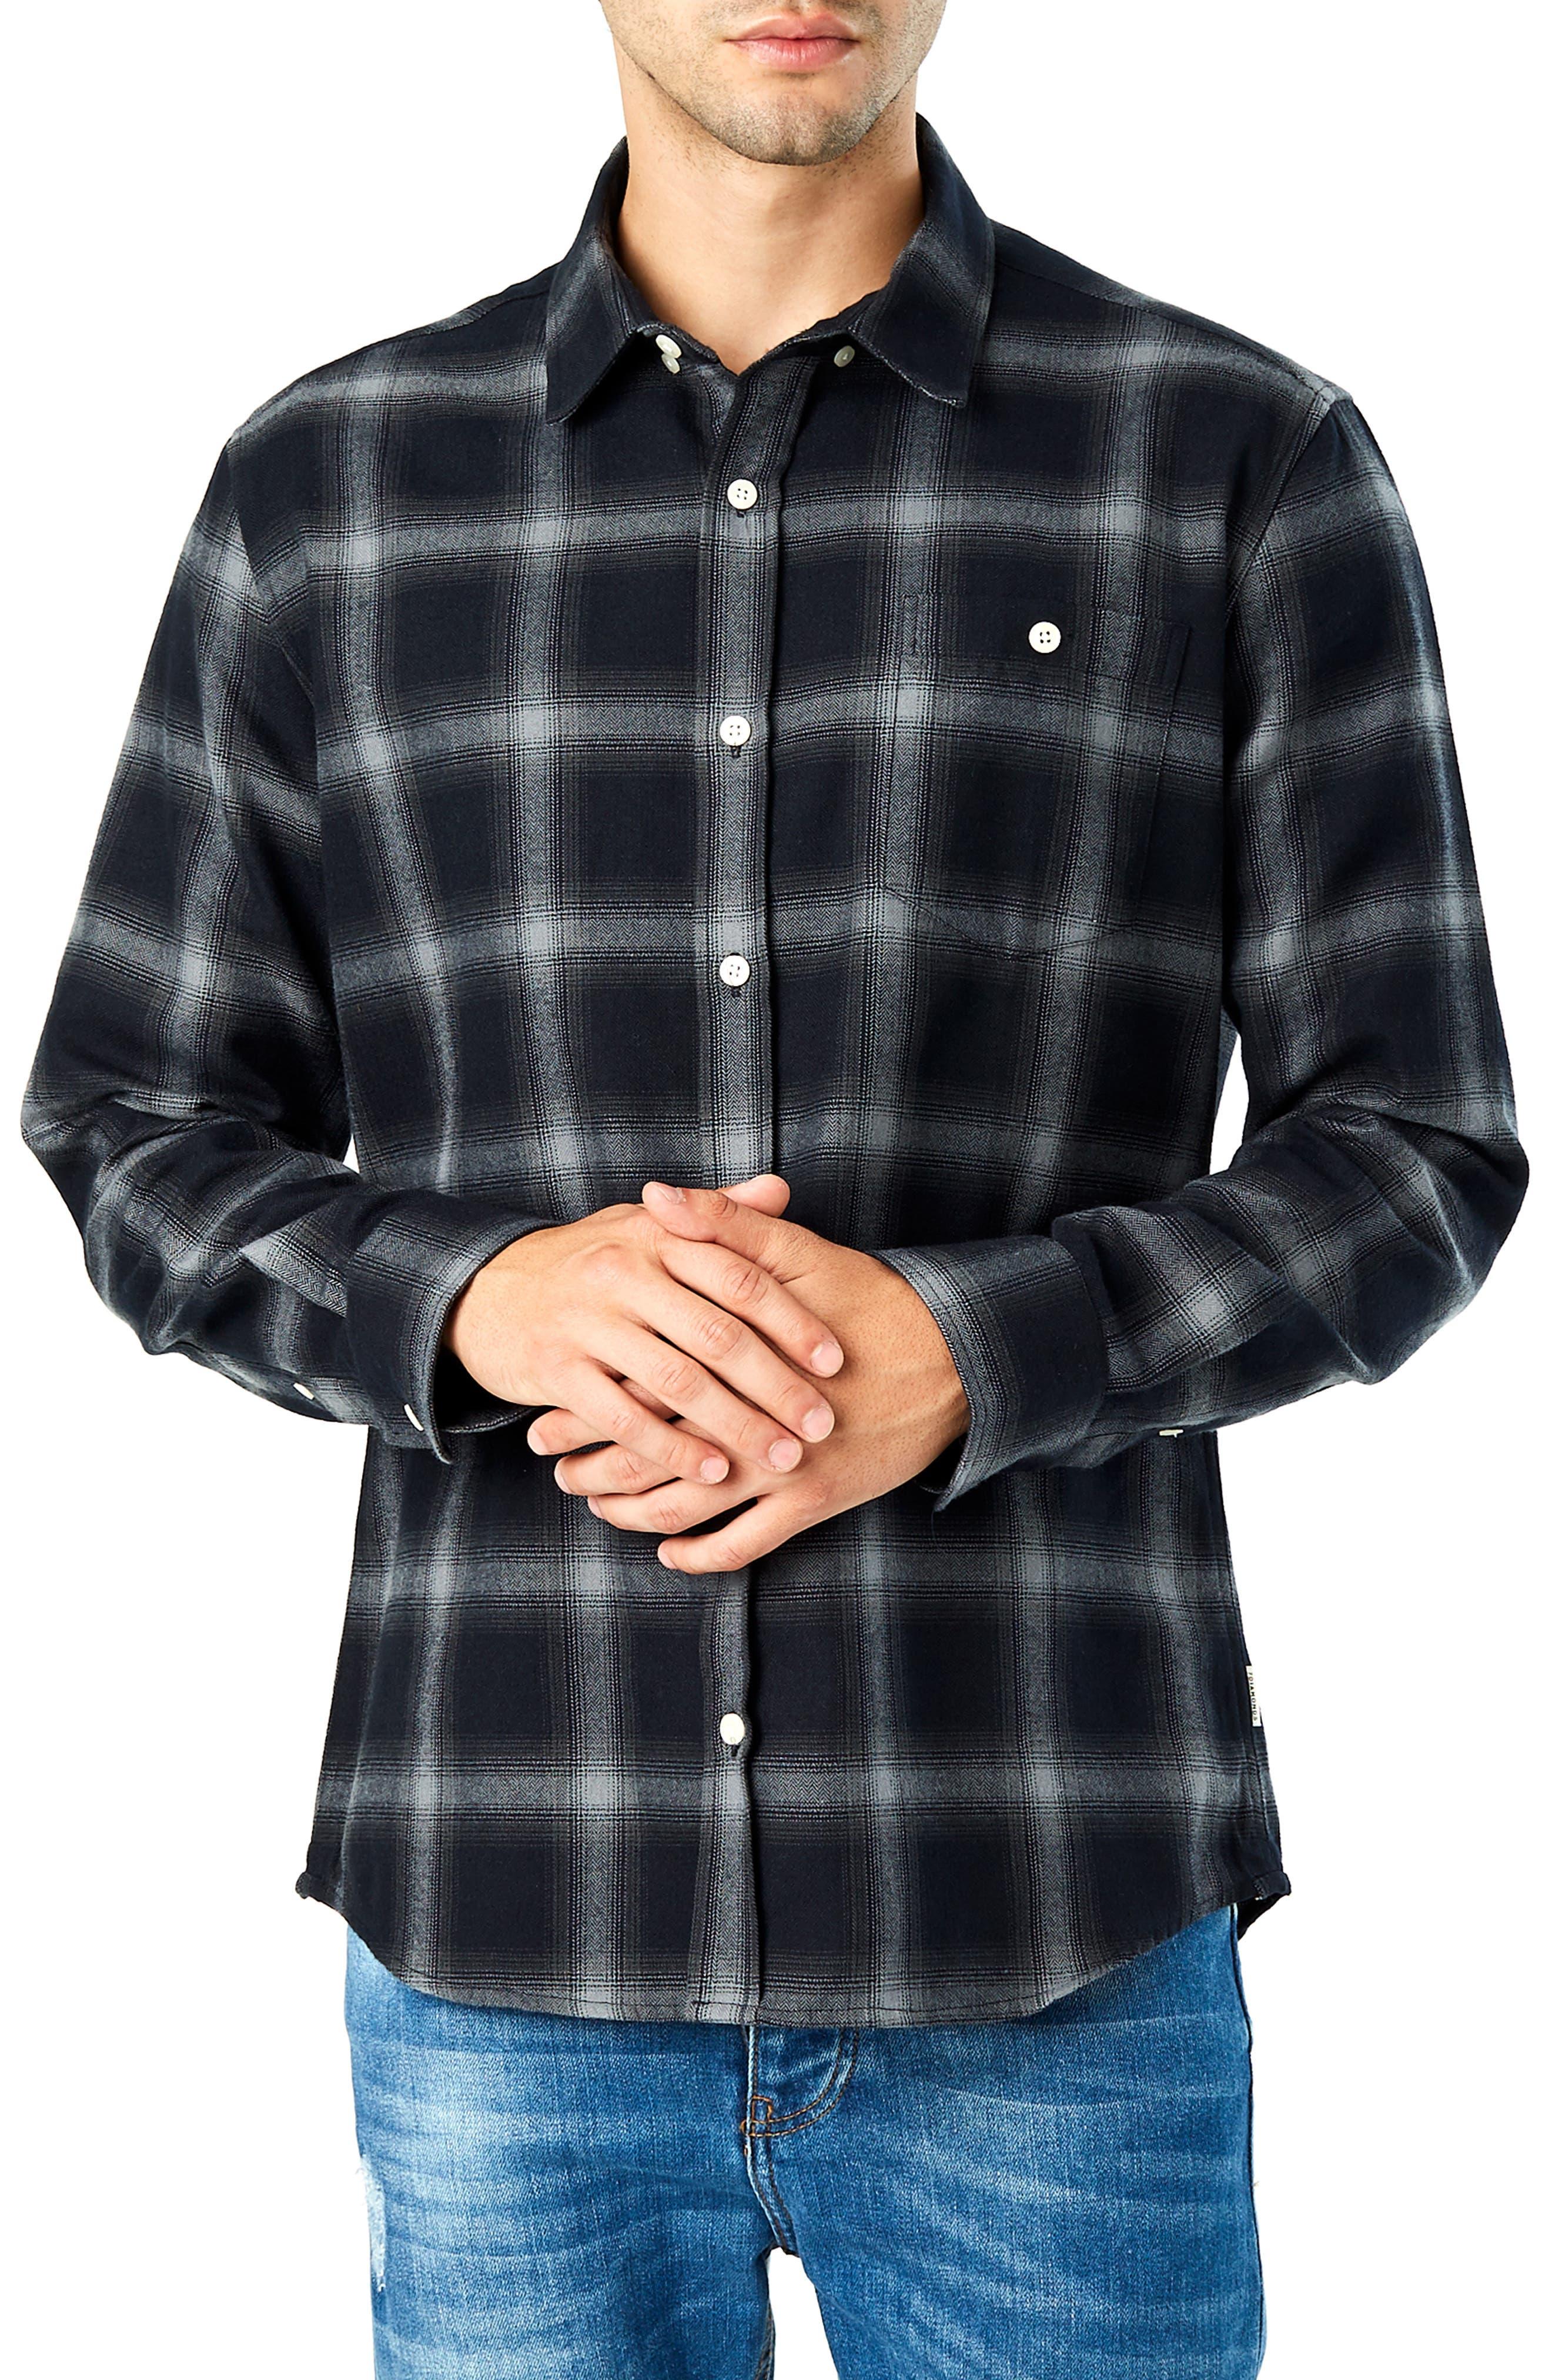 Hawk Slim Fit Sport Shirt,                             Main thumbnail 1, color,                             BLACK